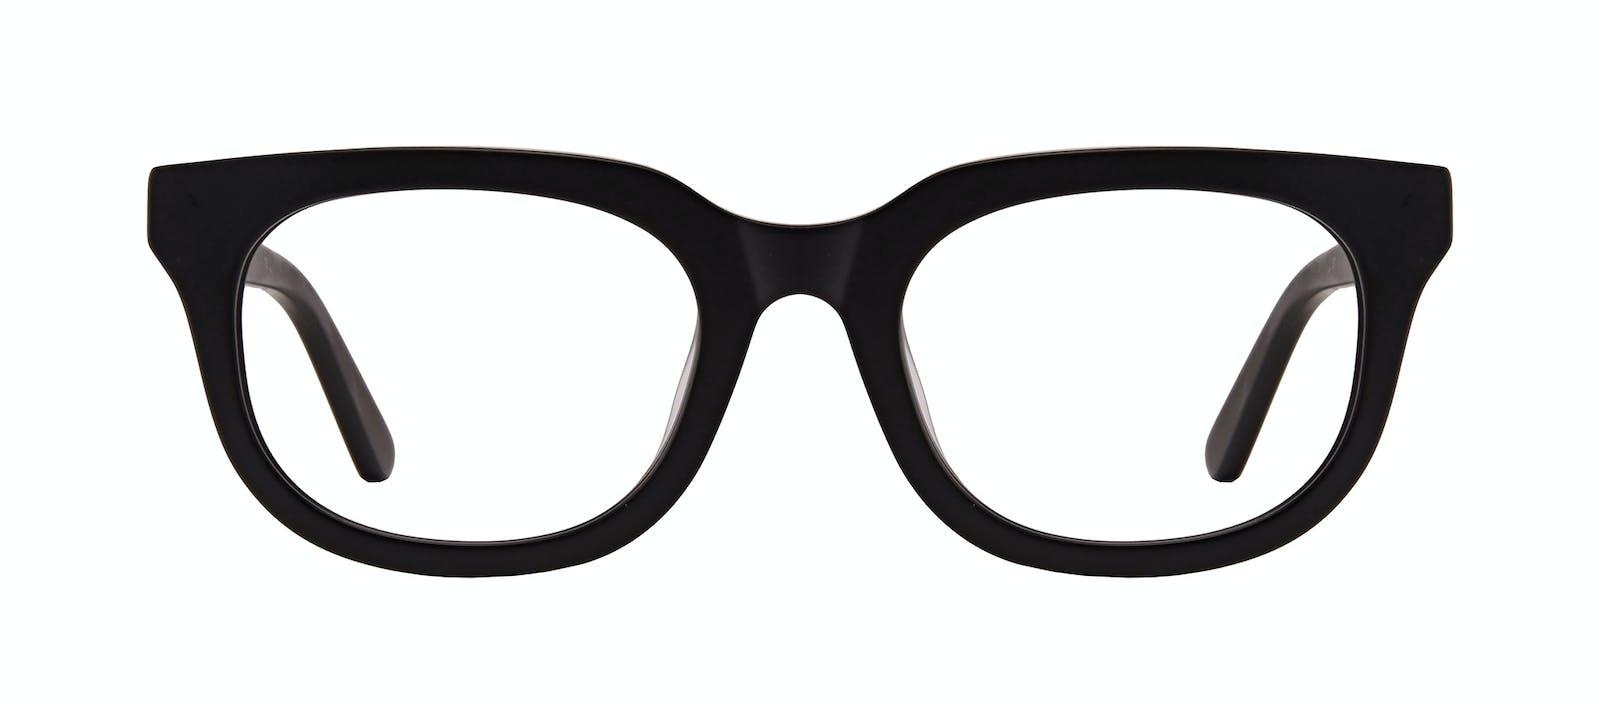 6a2bed8638 Affordable Fashion Glasses Square Eyeglasses Men Stout Matte Black Front